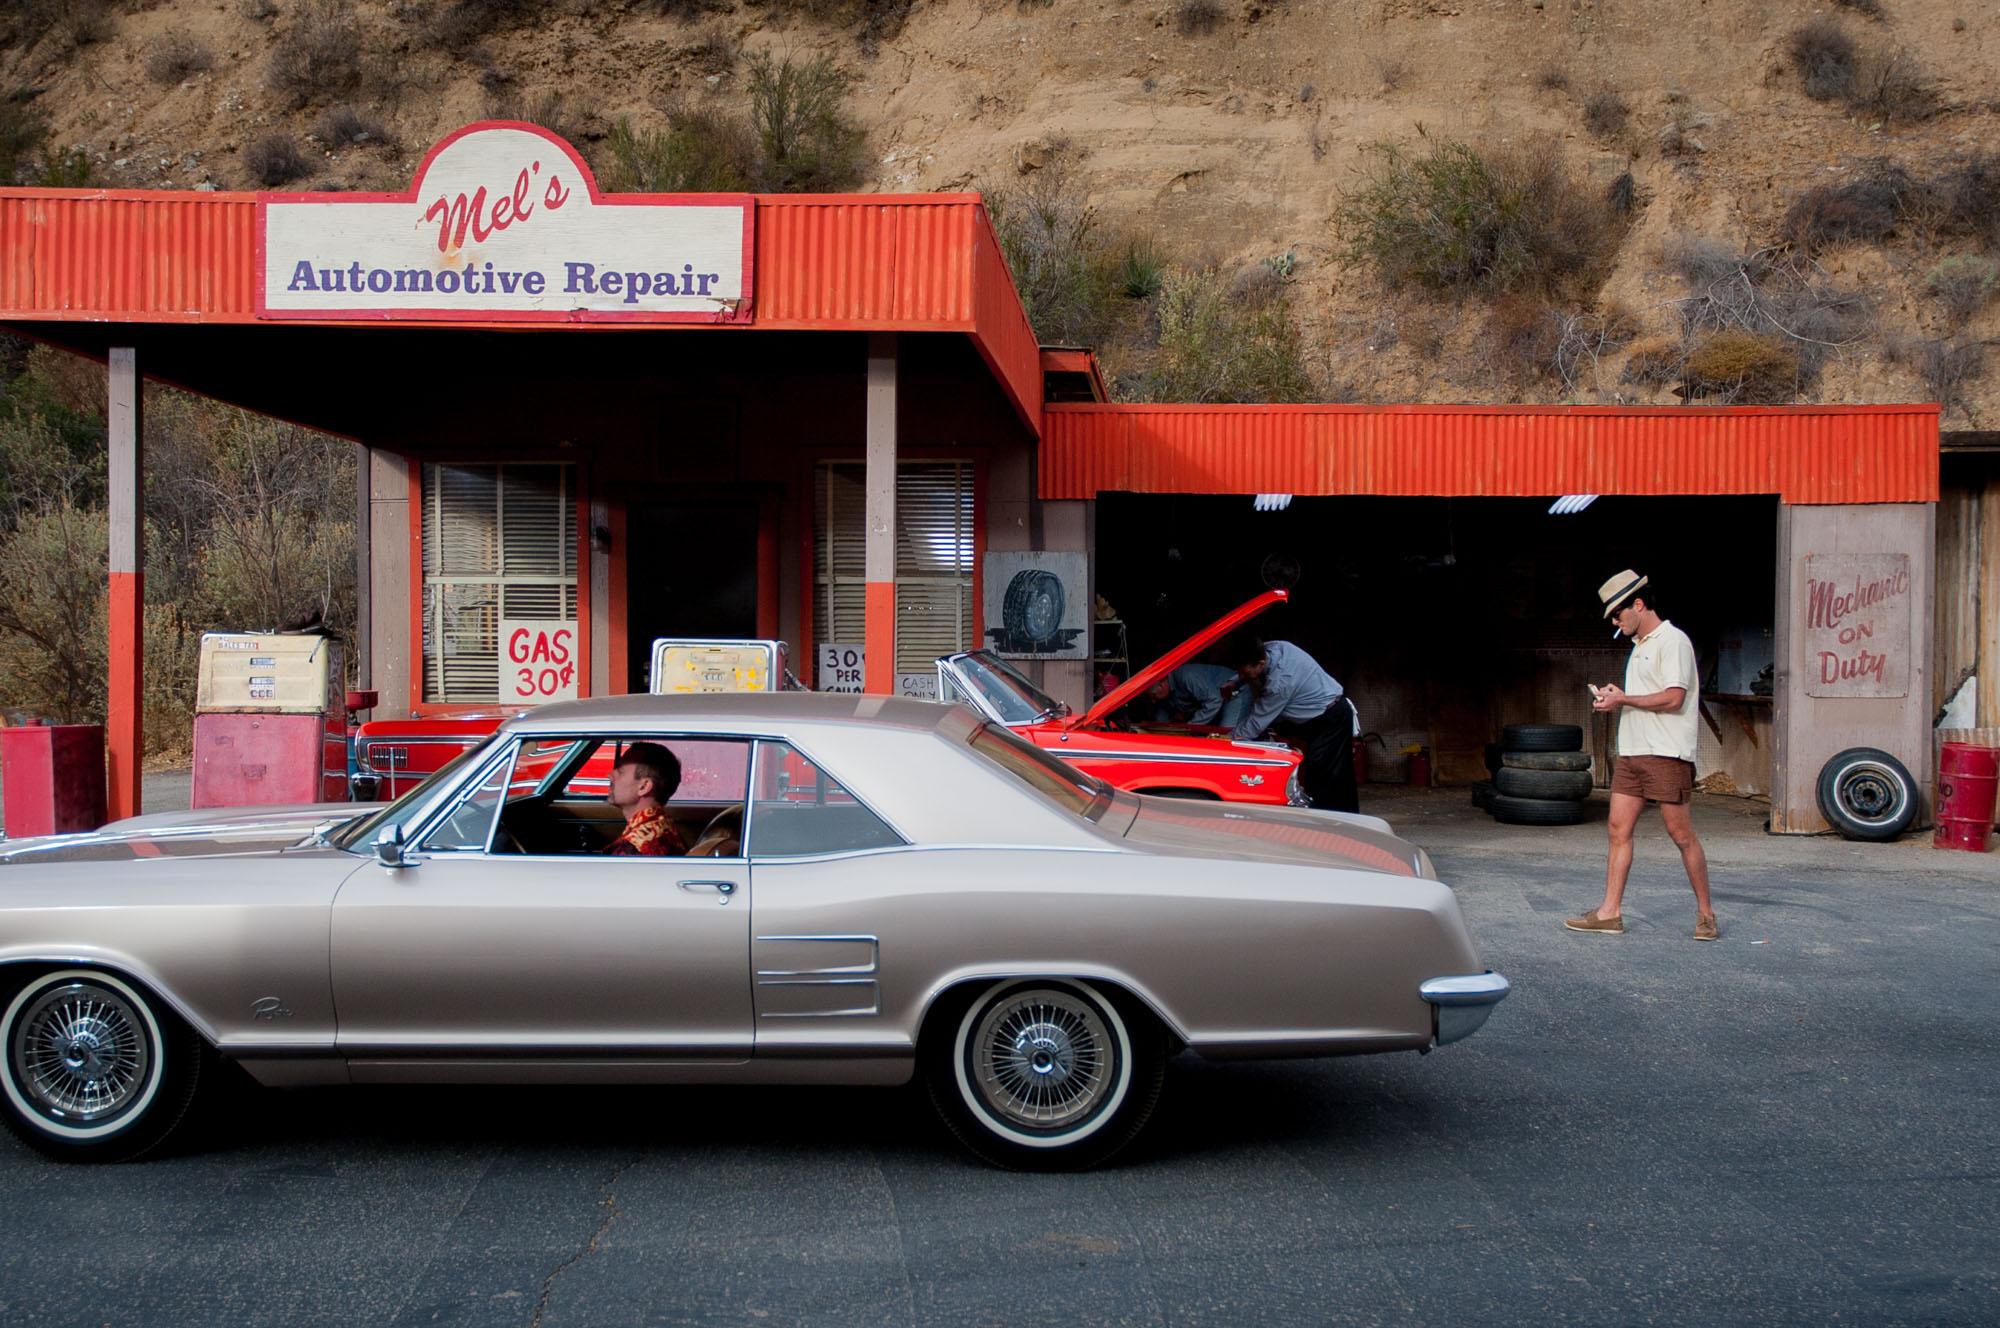 On Set: Automotive Landscape No. 1